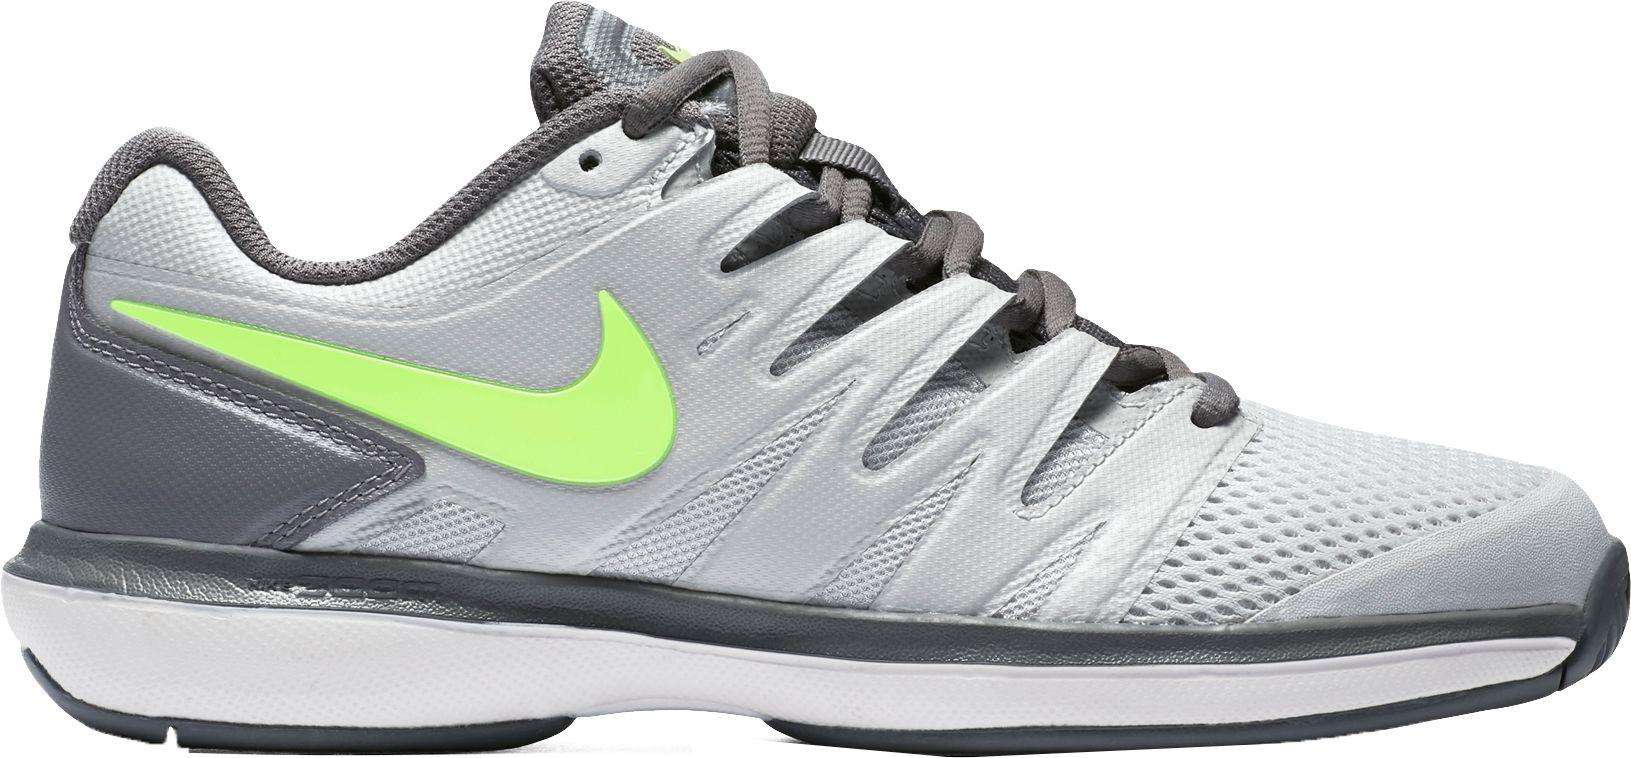 ae1a76e345c8 Lyst - Nike Court Air Zoom Prestige Hard Court Tennis Shoe in Gray